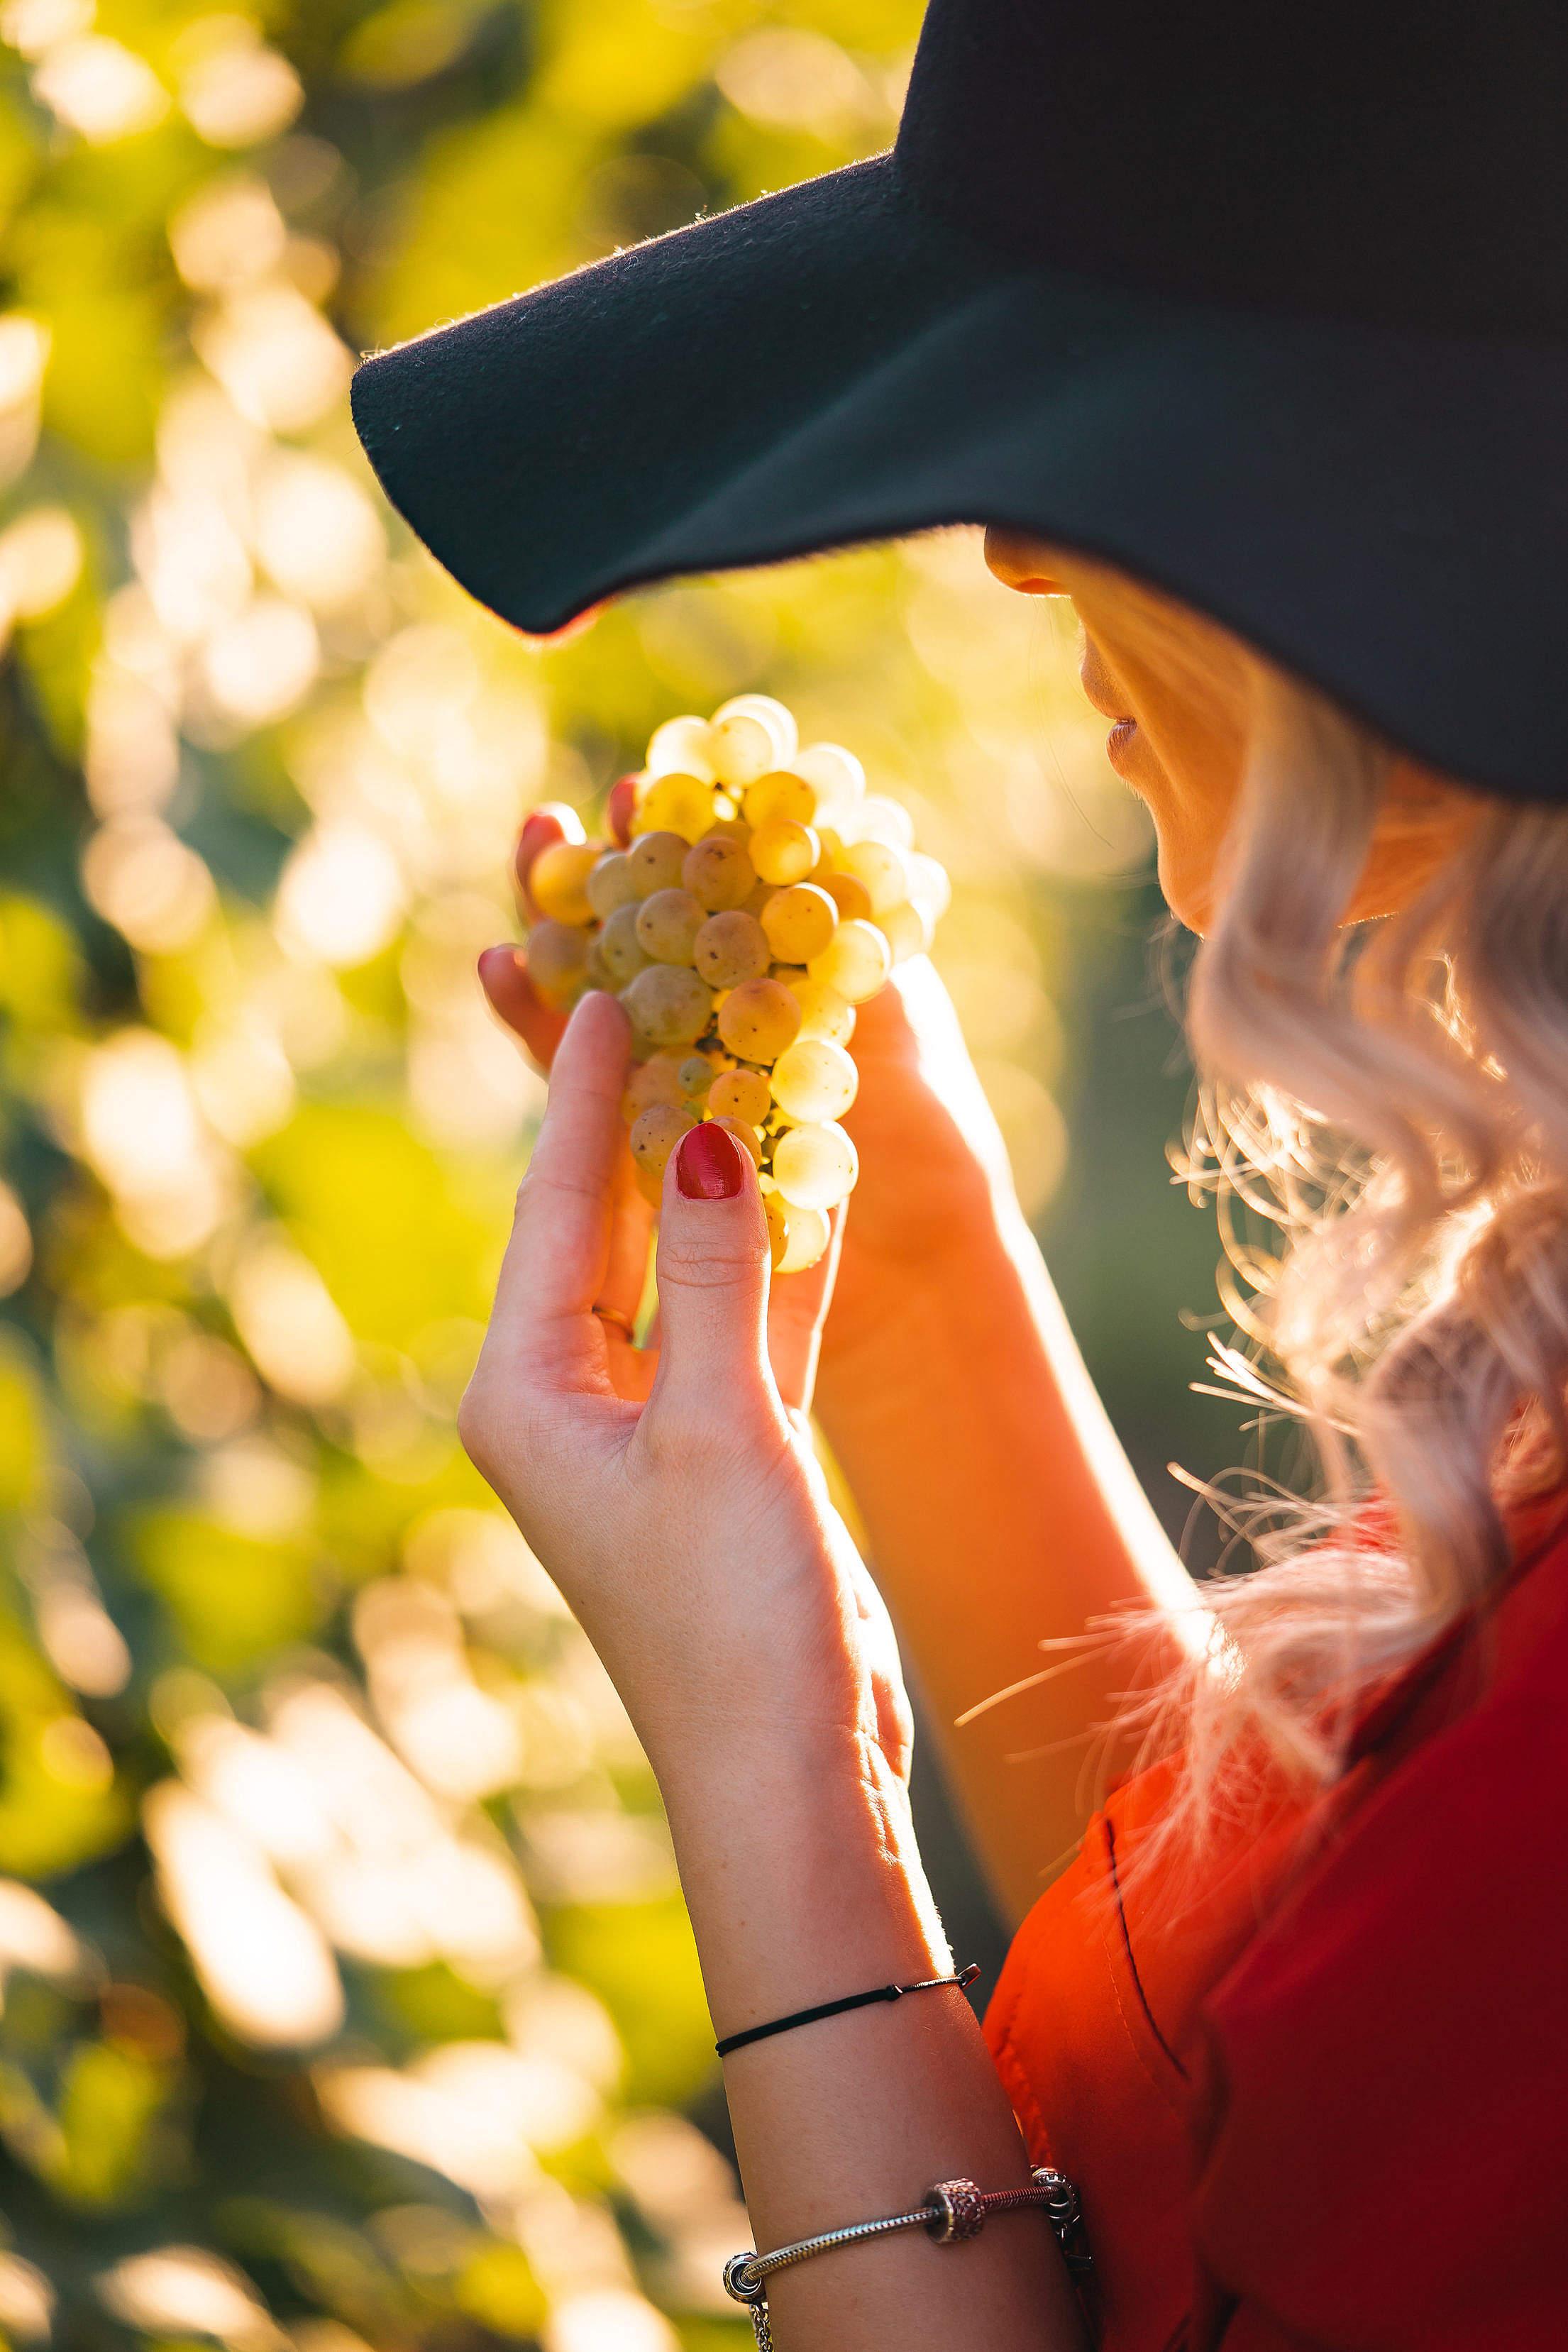 Woman Eating Grapes Free Stock Photo